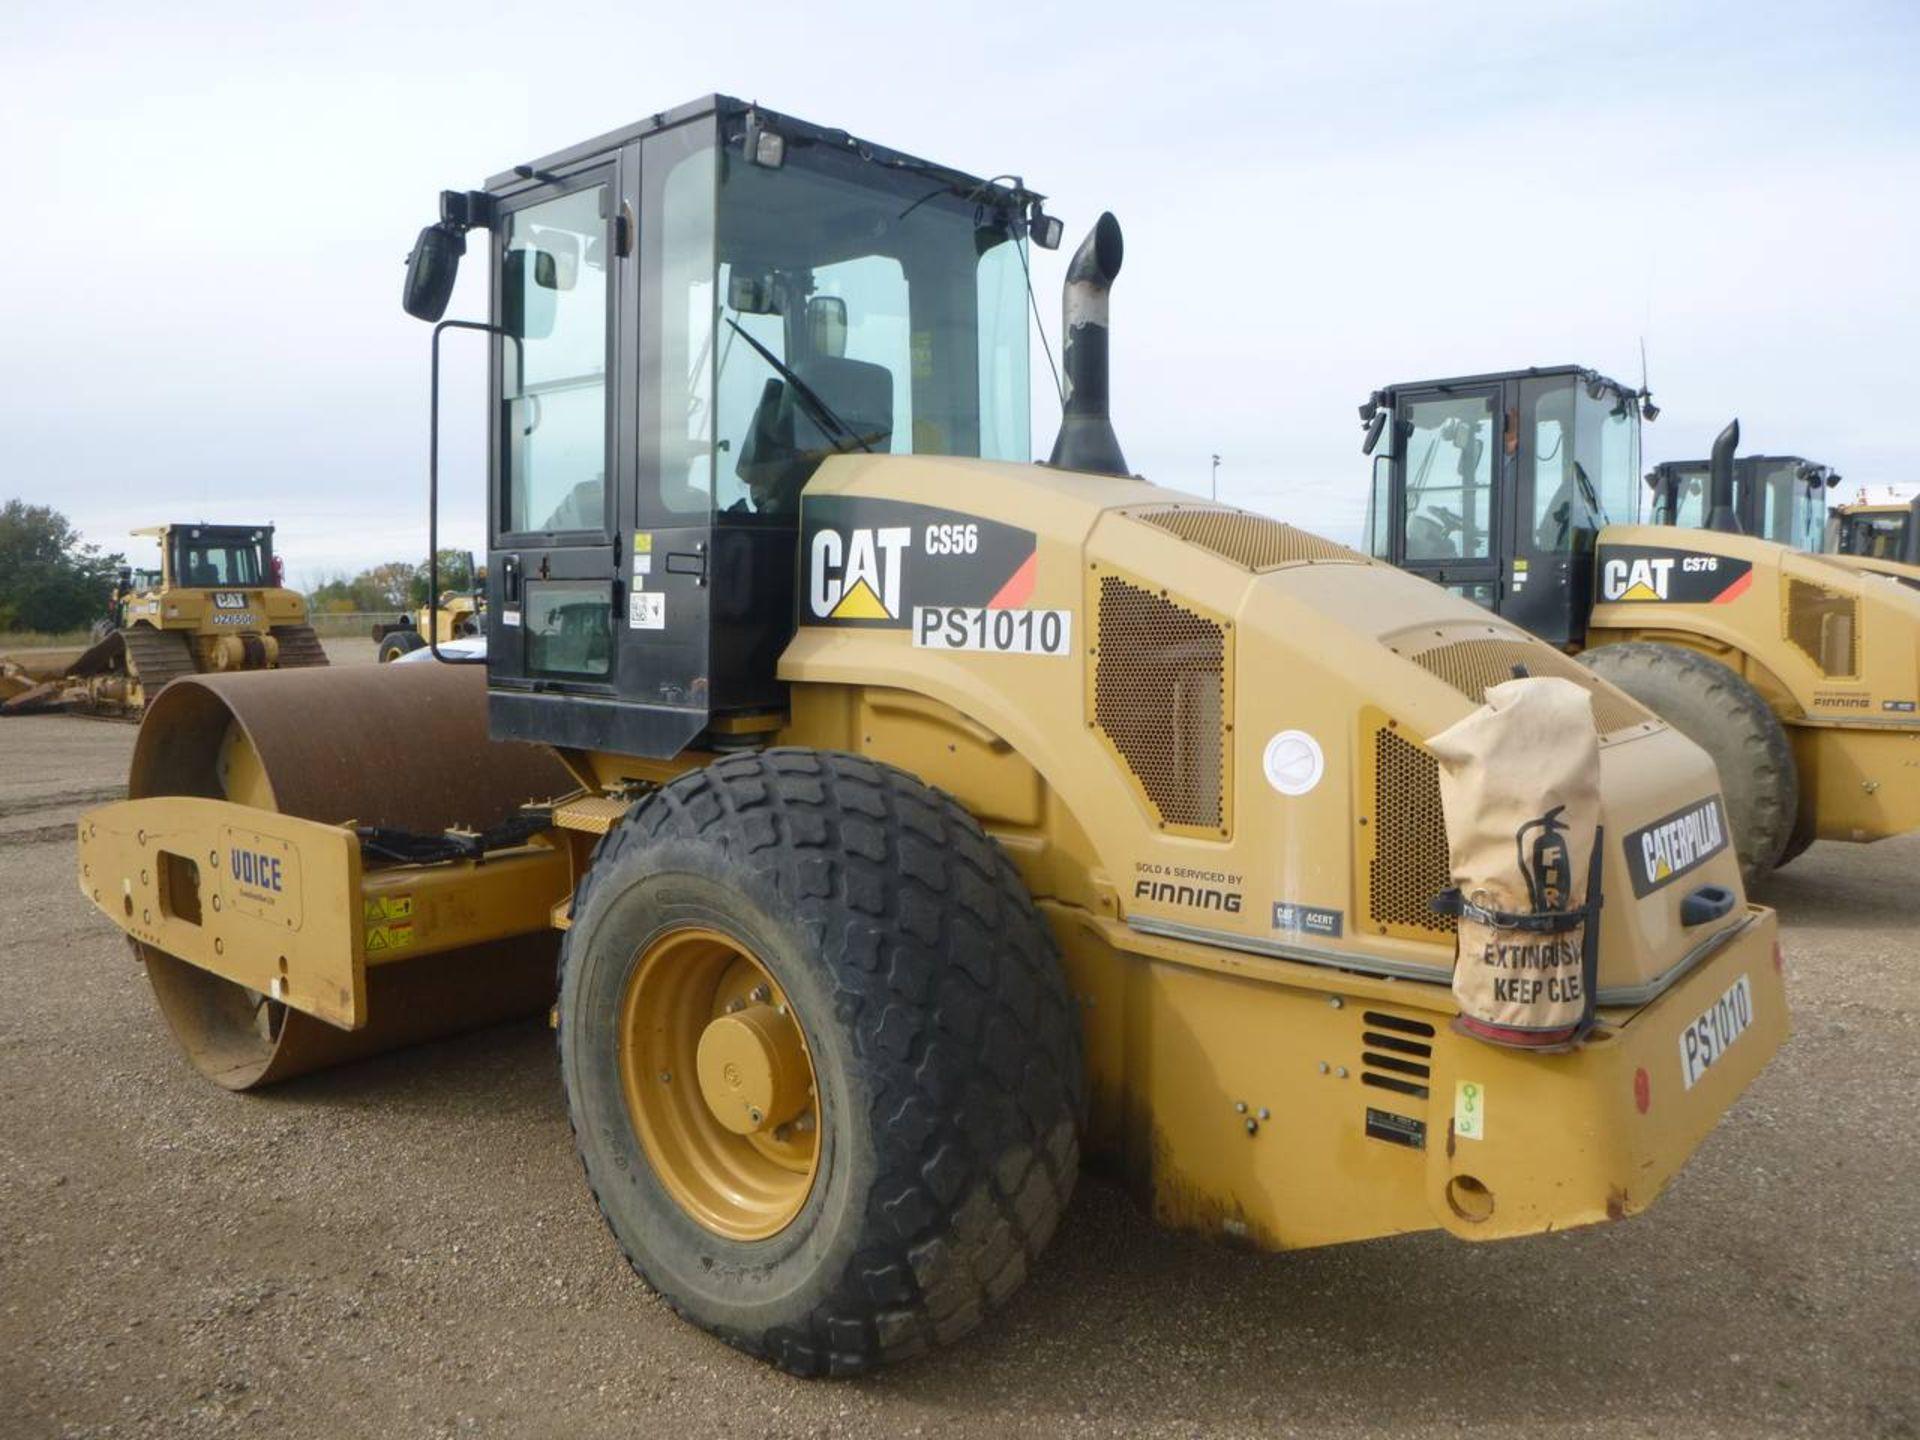 2011 Caterpillar CS56 Compactor - Image 4 of 9